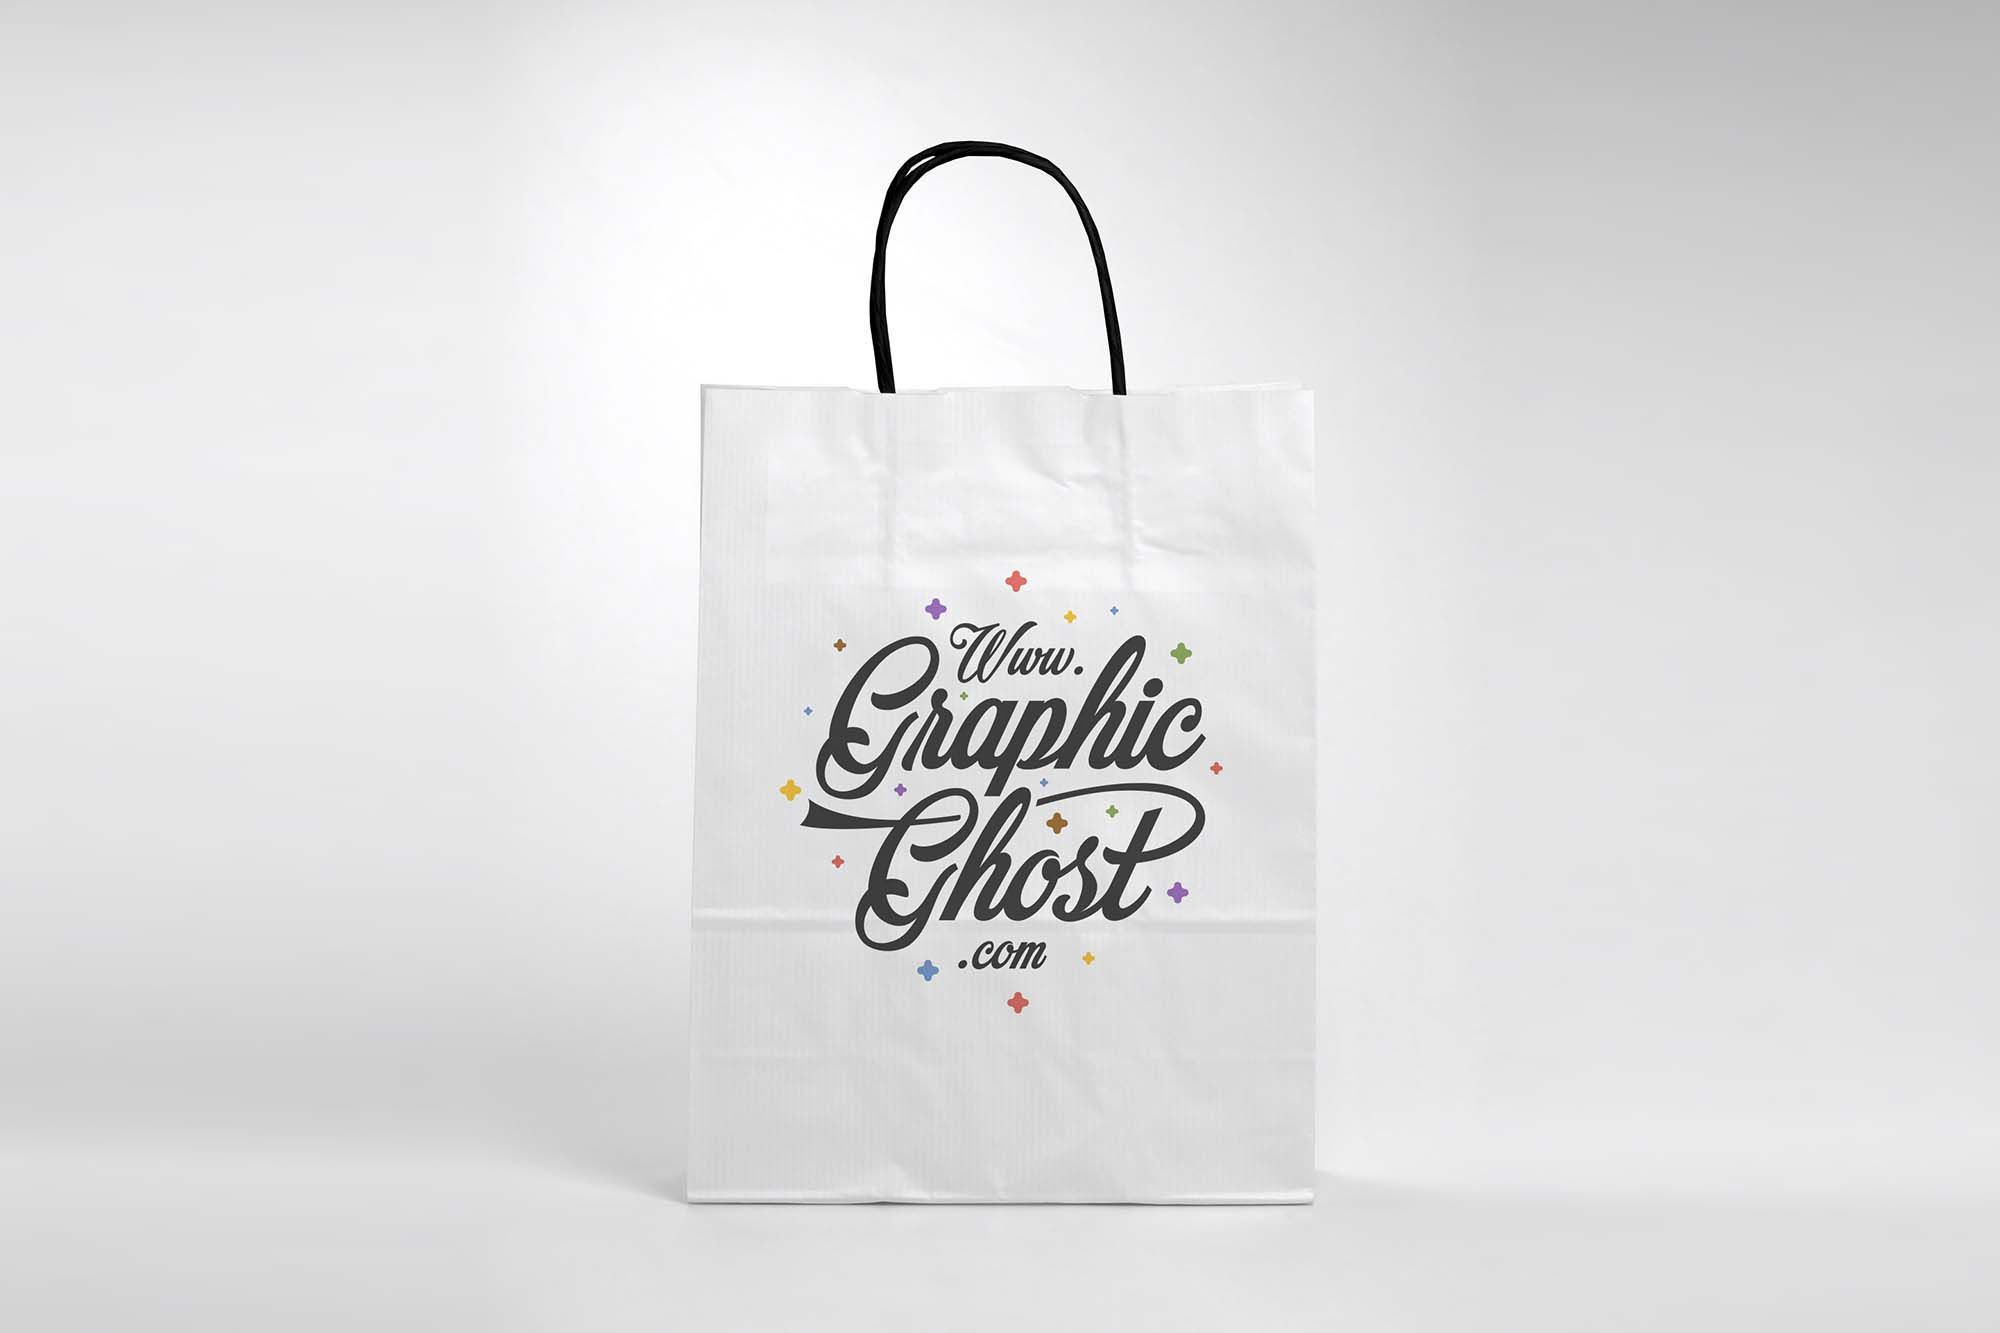 Download Free Realistic Paper Bag Mockup Psd Bag Mockup Free Paper Mockup Free Psd